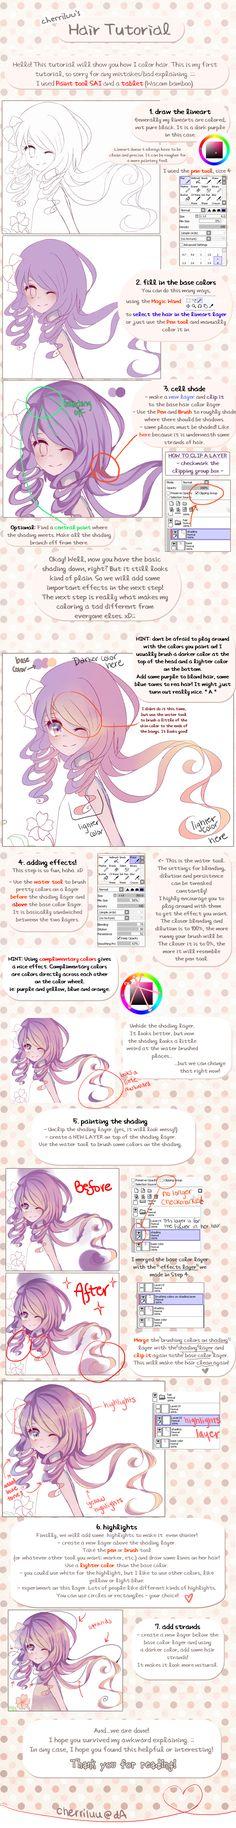 Hair tutorial by cherriluu on DeviantArt